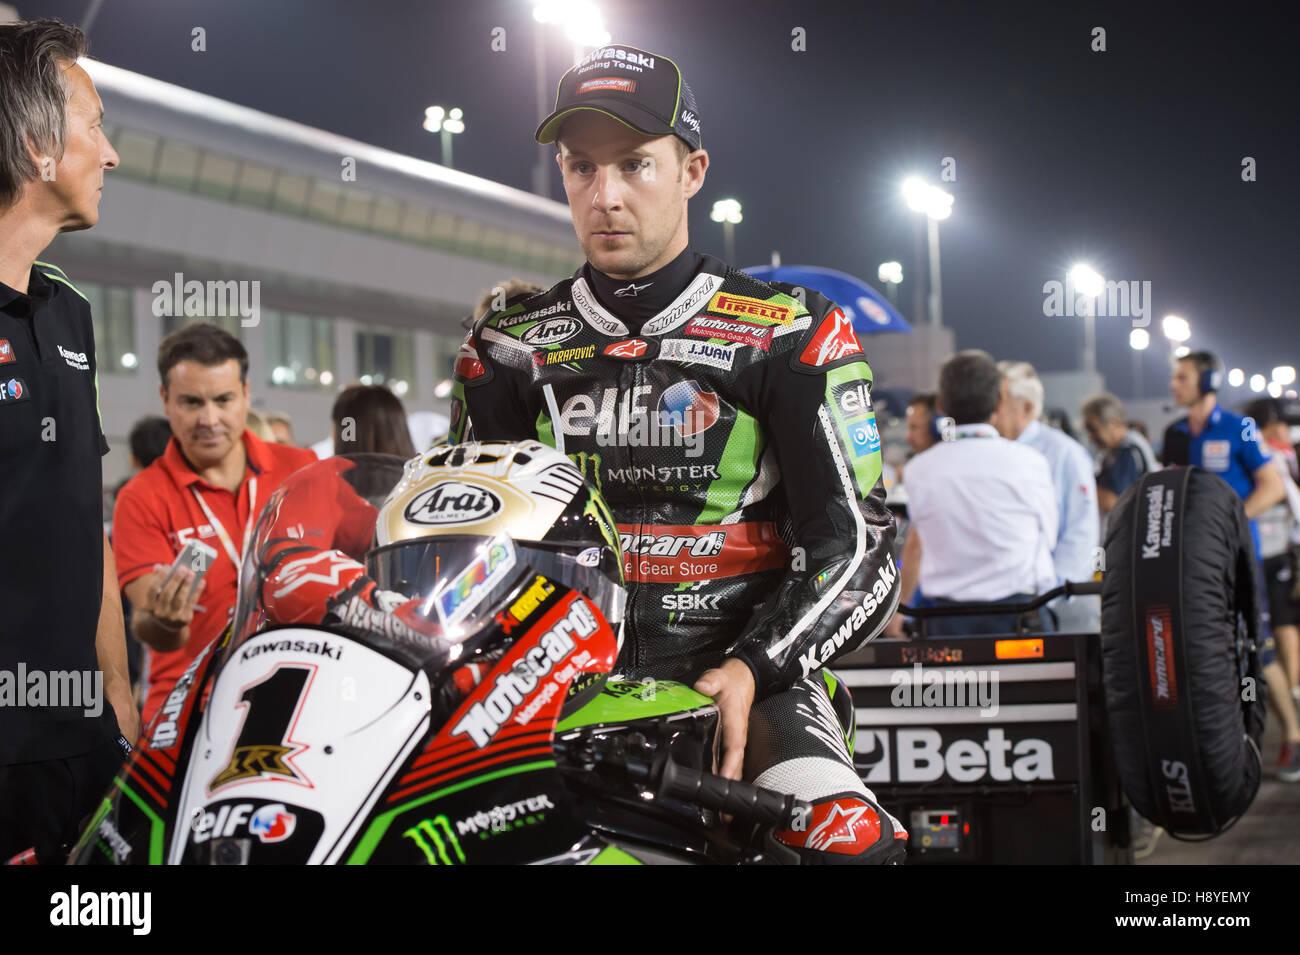 Losail International Circuit, Qatar. 30th Oct, 2016. Kawasaki  rider rider Jonathan Rea  on the start grid before - Stock Image